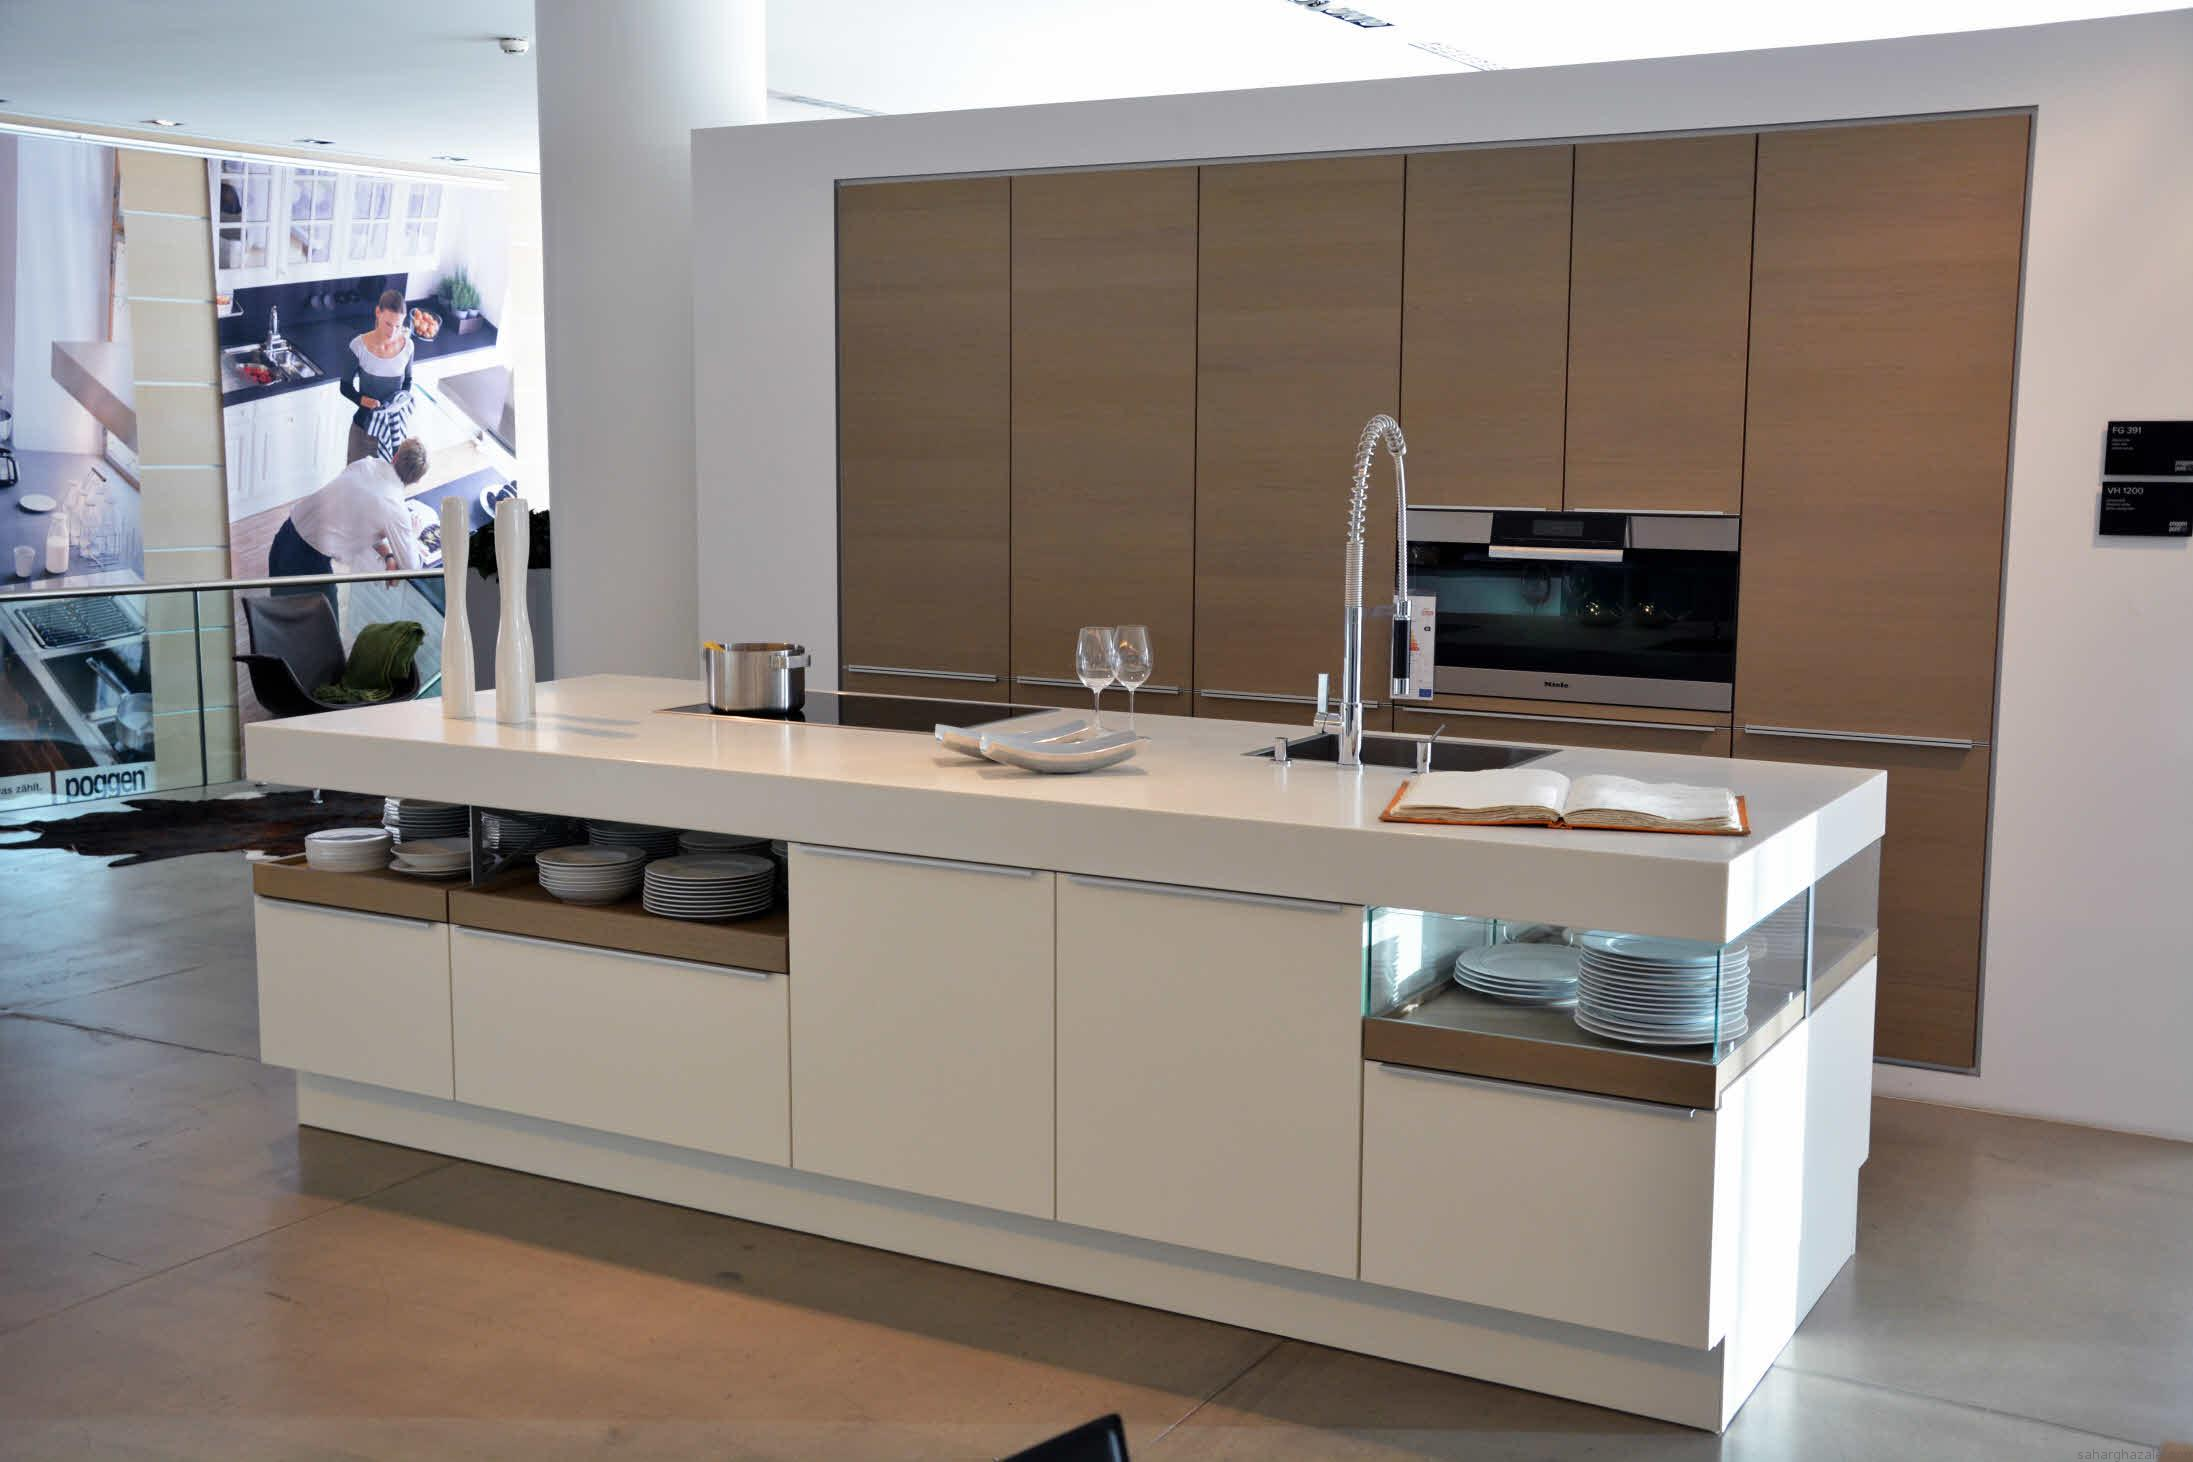 Kitchen design design lifestyle blog for Kitchen decor blogs